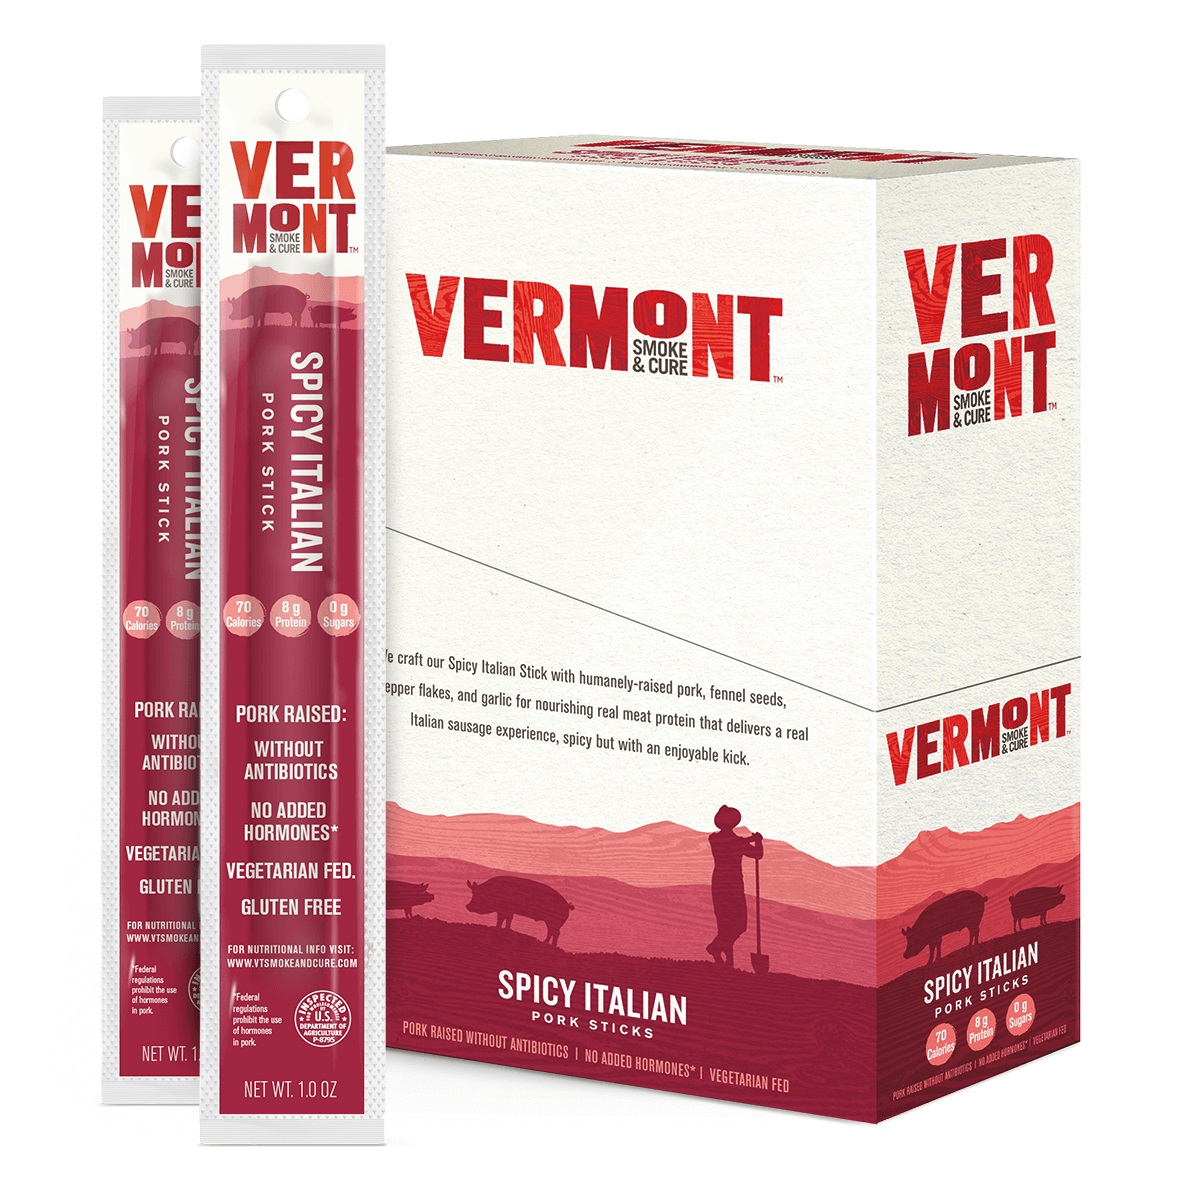 Vermont Smoke & Cure Meat Sticks, Pork, Antibiotic Free, Gluten Free, Spicy Italian, 1oz Stick, 24 Count